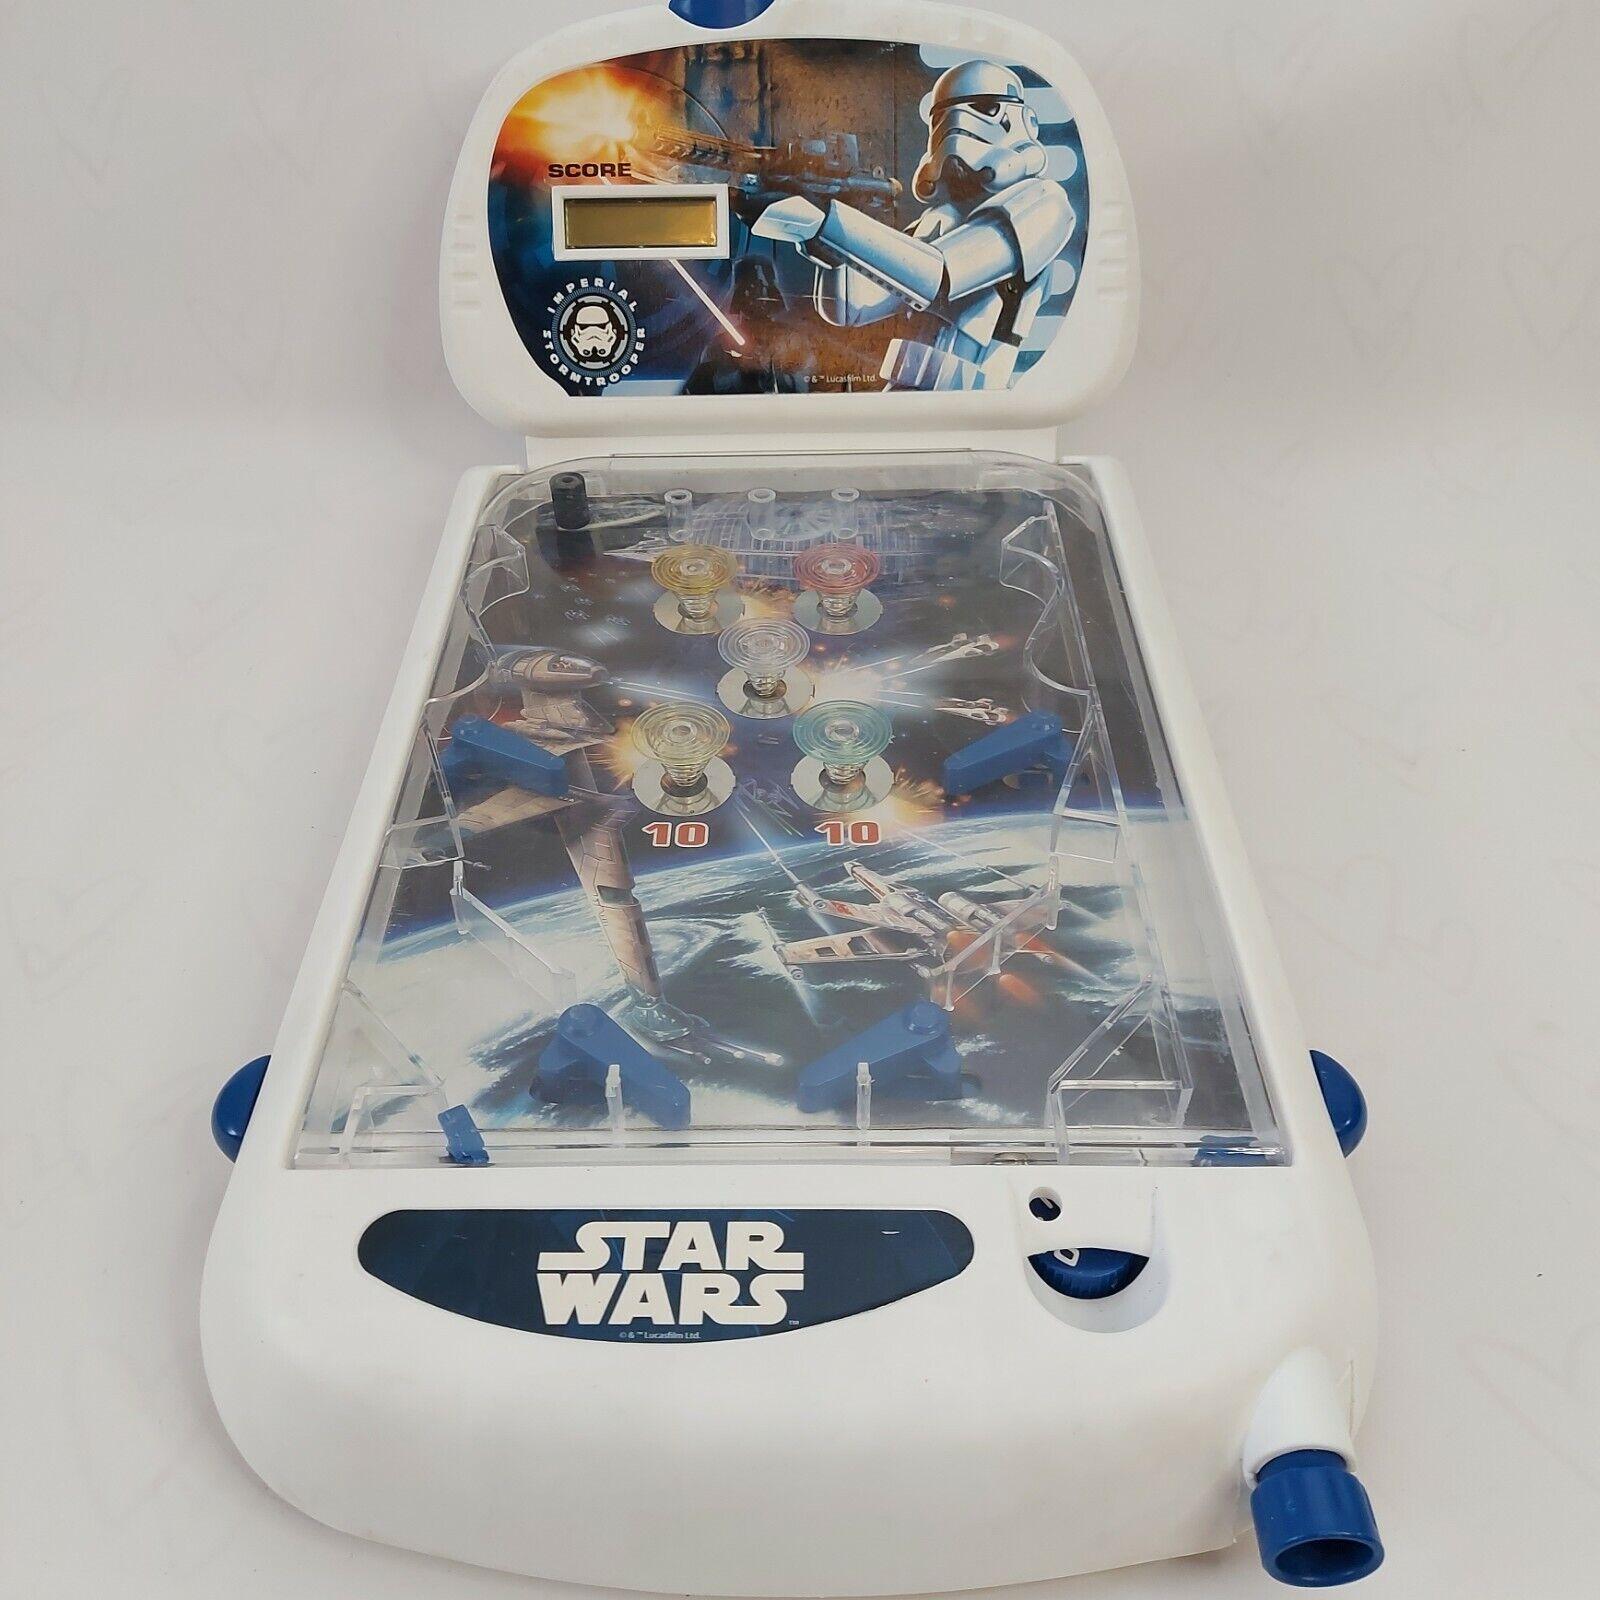 Star Wars Table Top Mini Pinball Machine Fun Toys Lucas Film Ltd Working